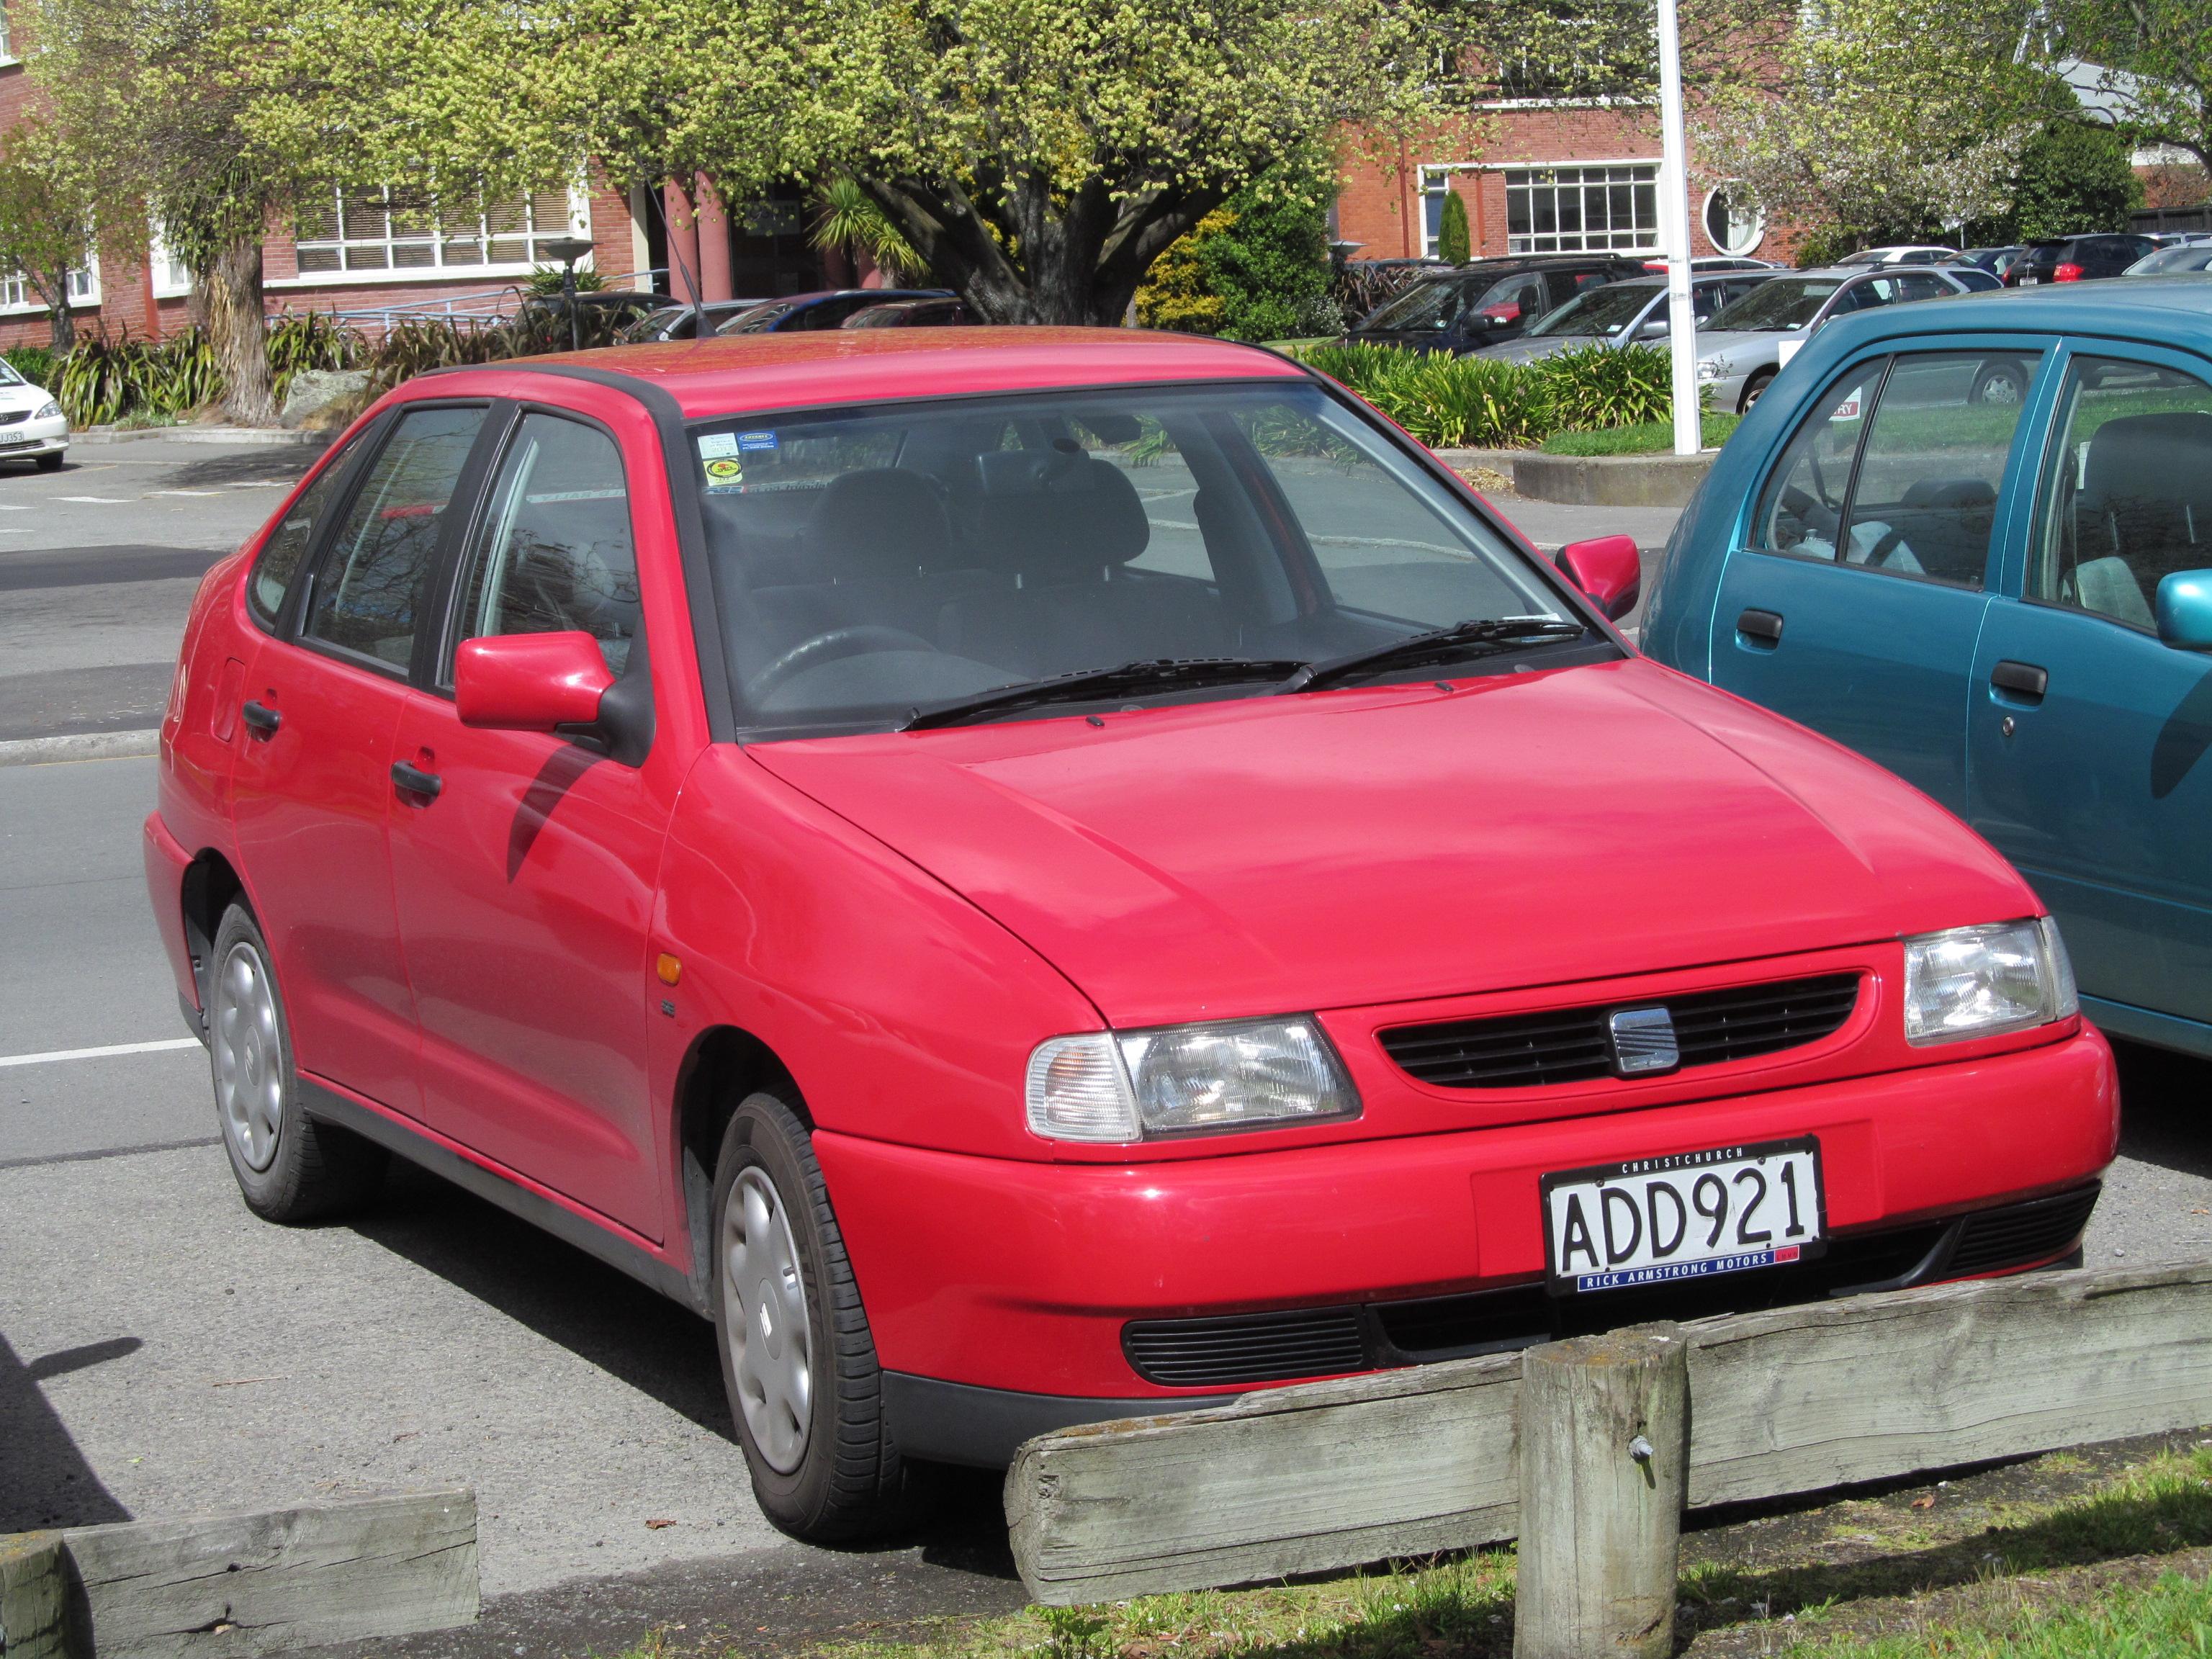 File:2001 SEAT Cordoba 1.6 Manual (10454719143).jpg